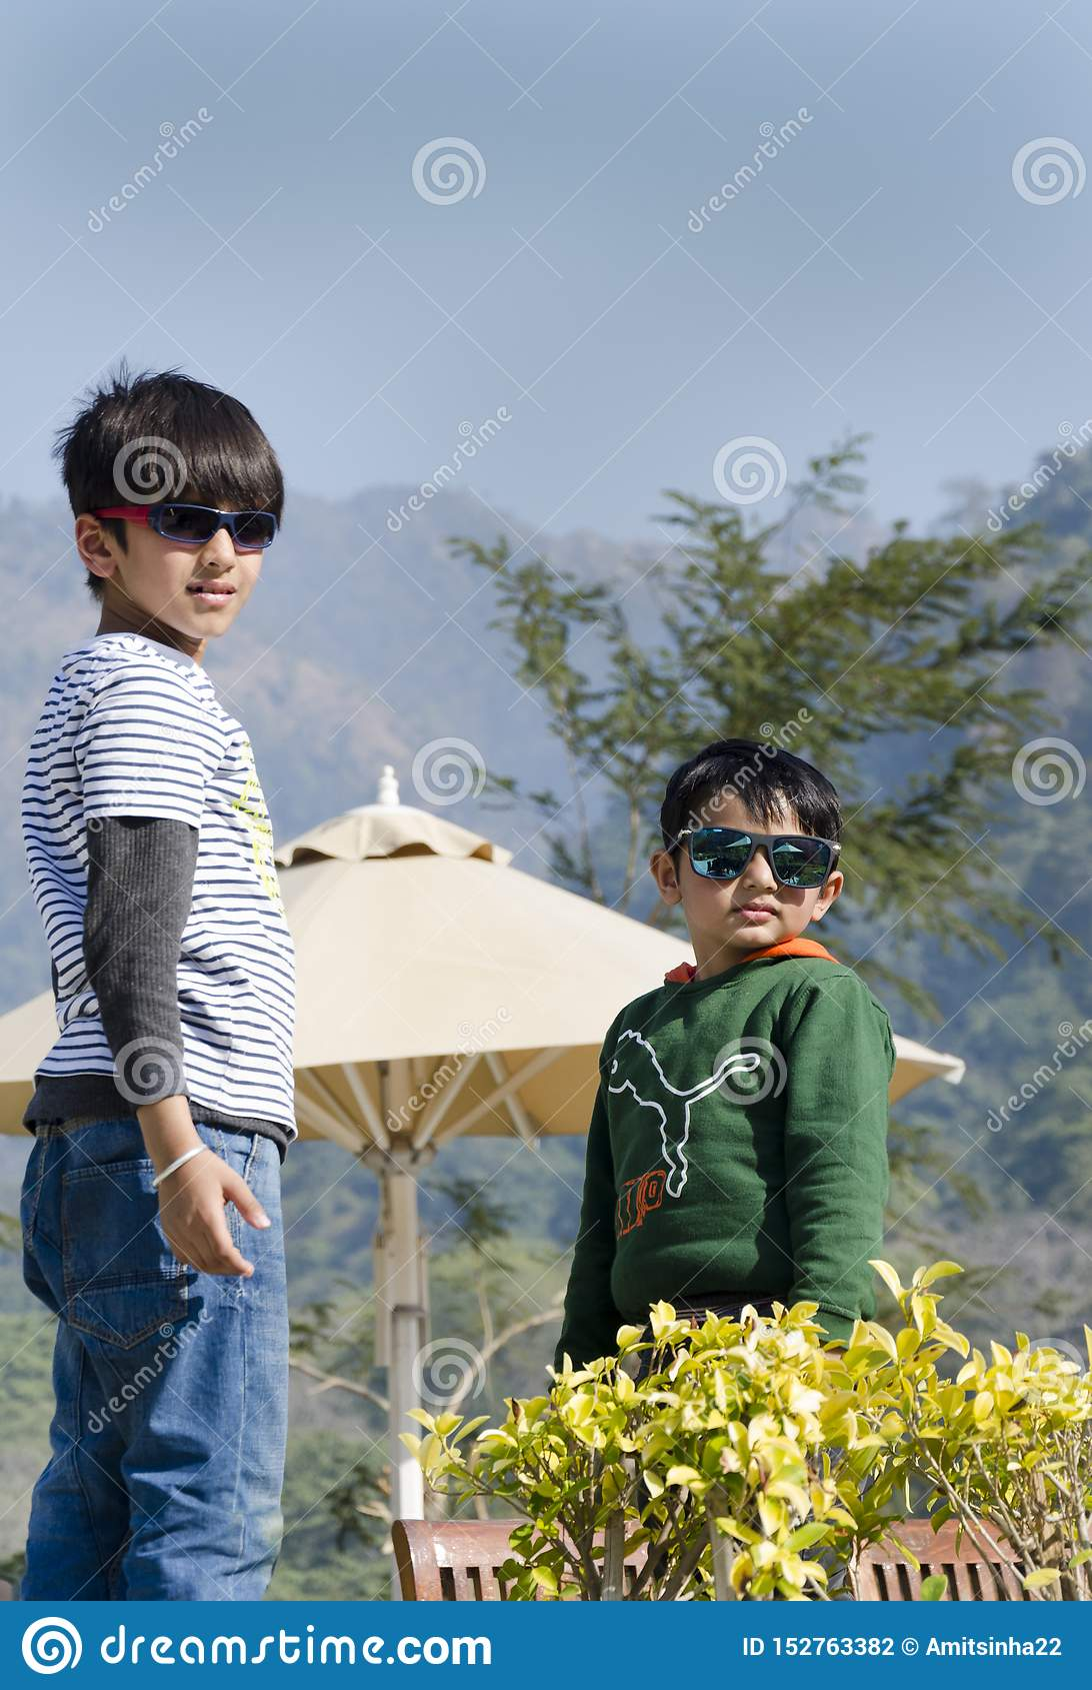 Two stylish kids having fun